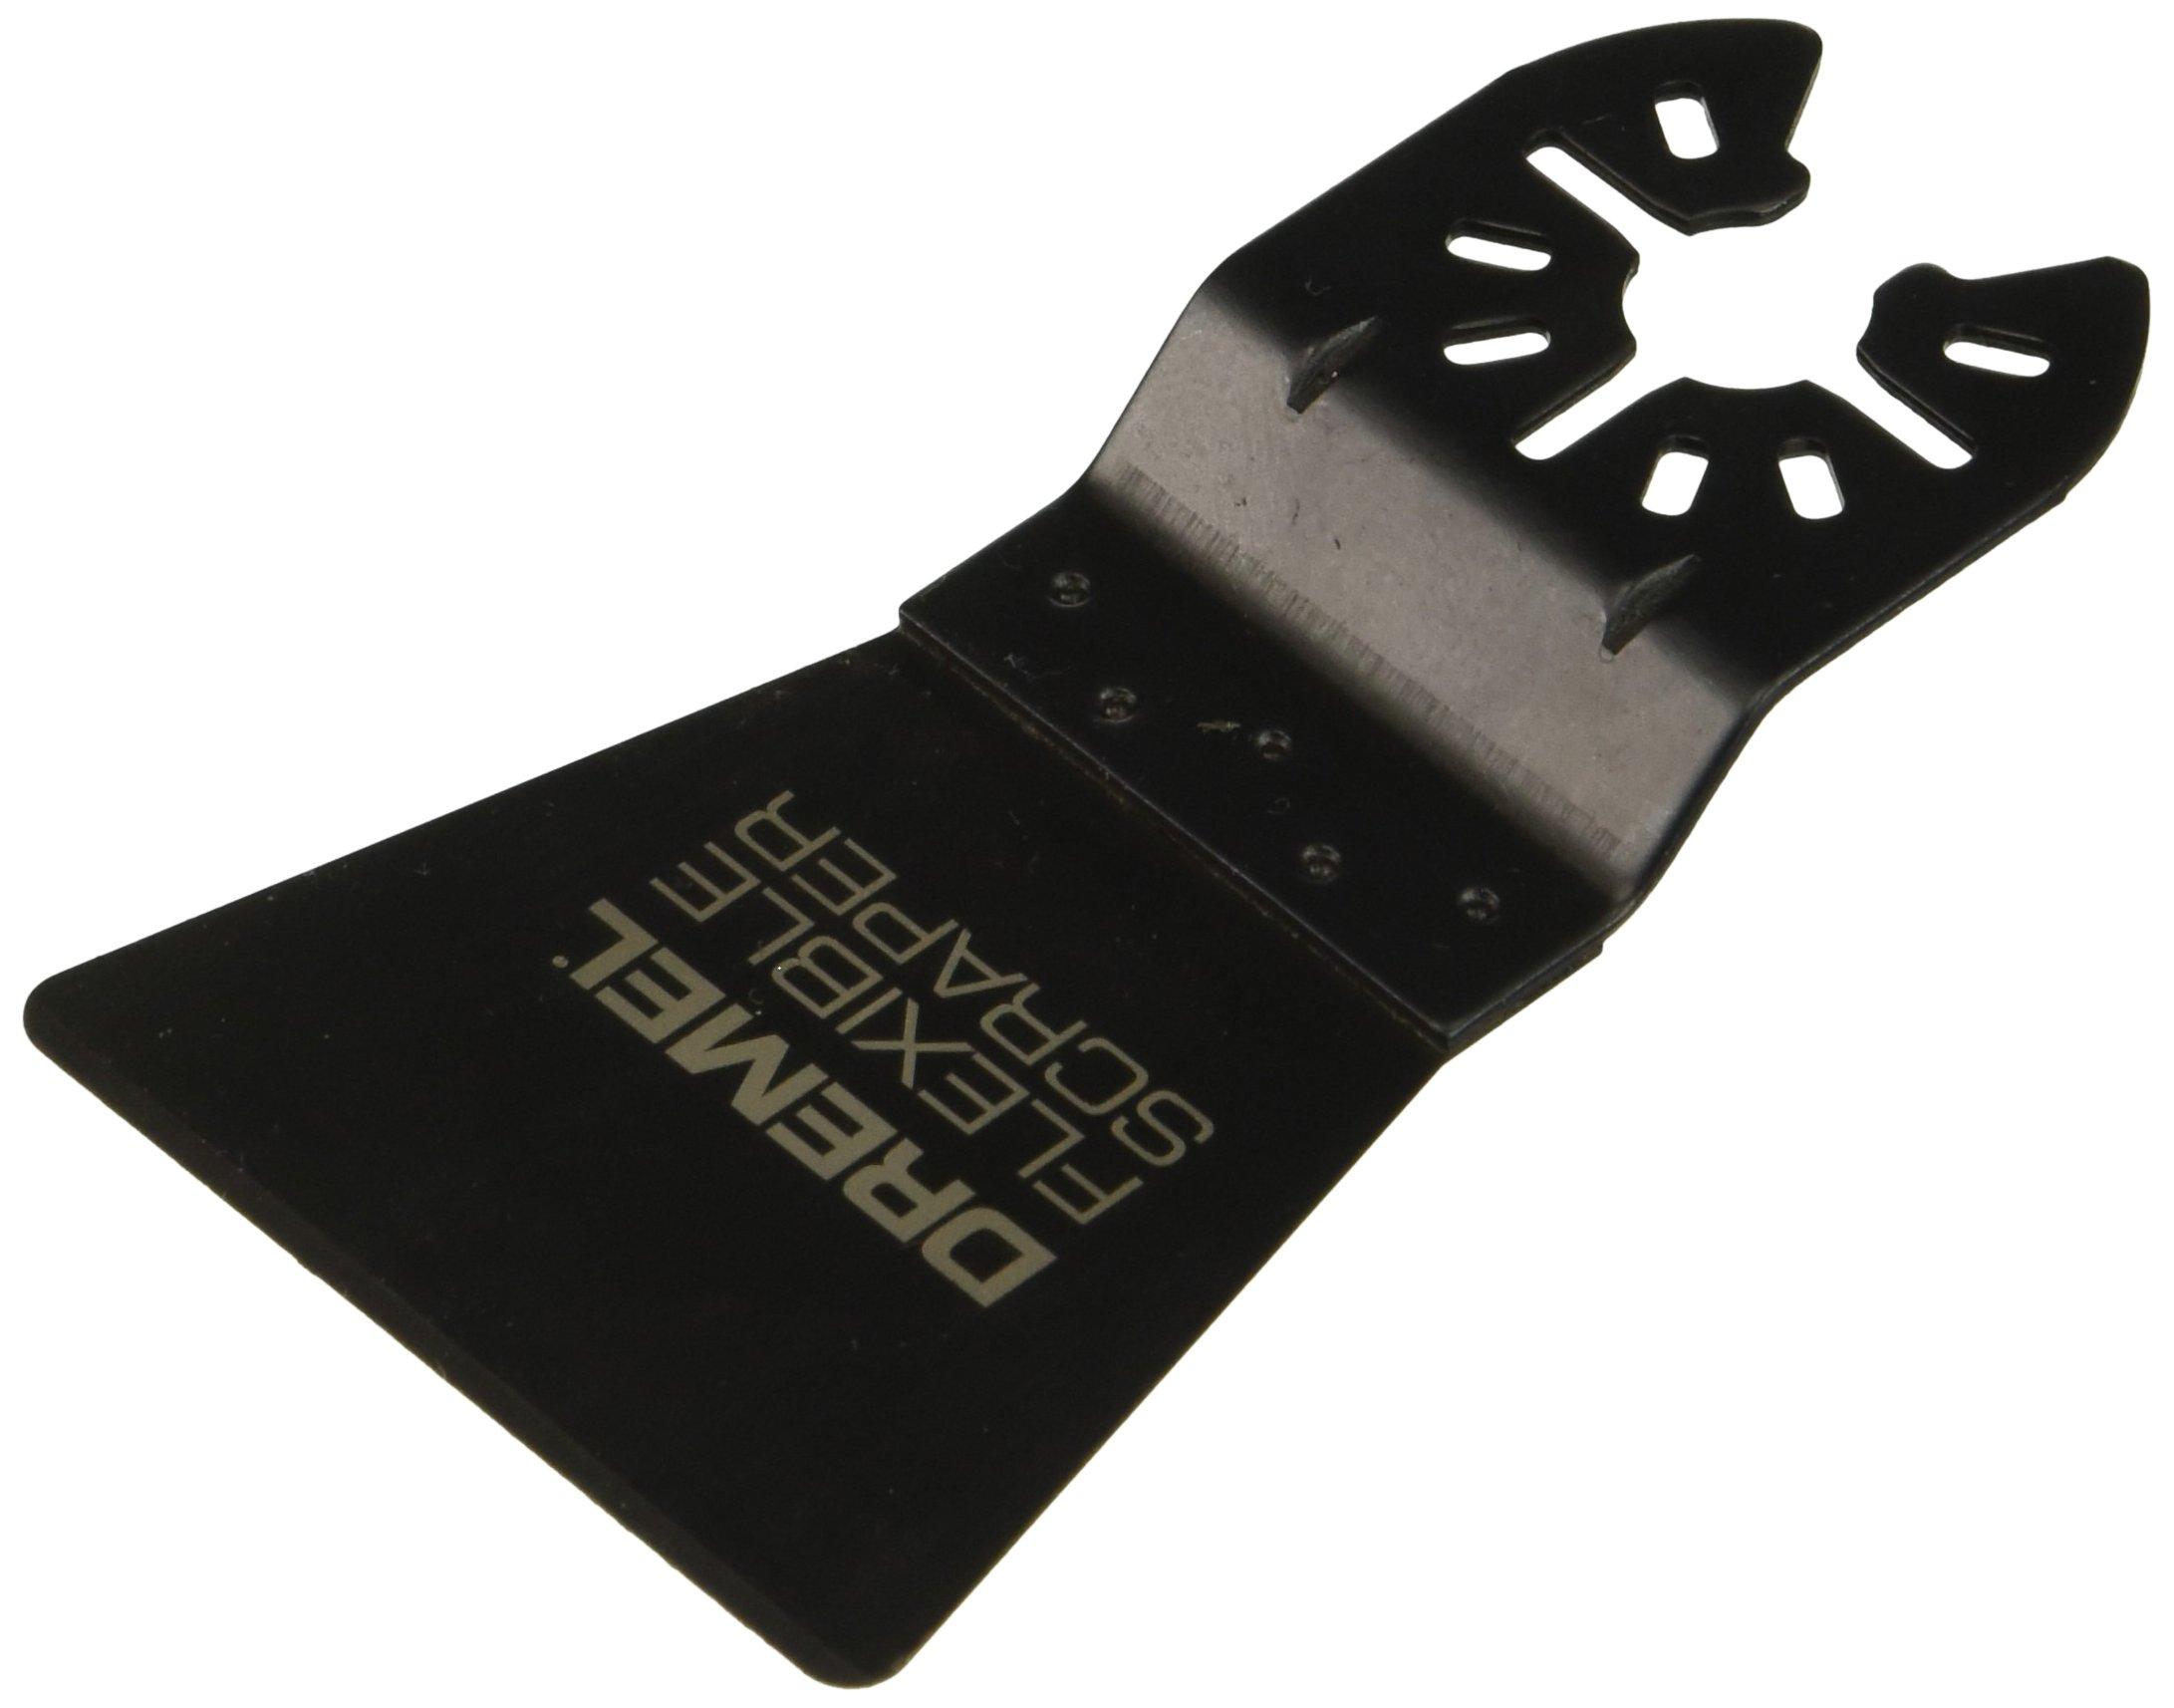 Dremel MM610 Multi-Max Flexible Scraper